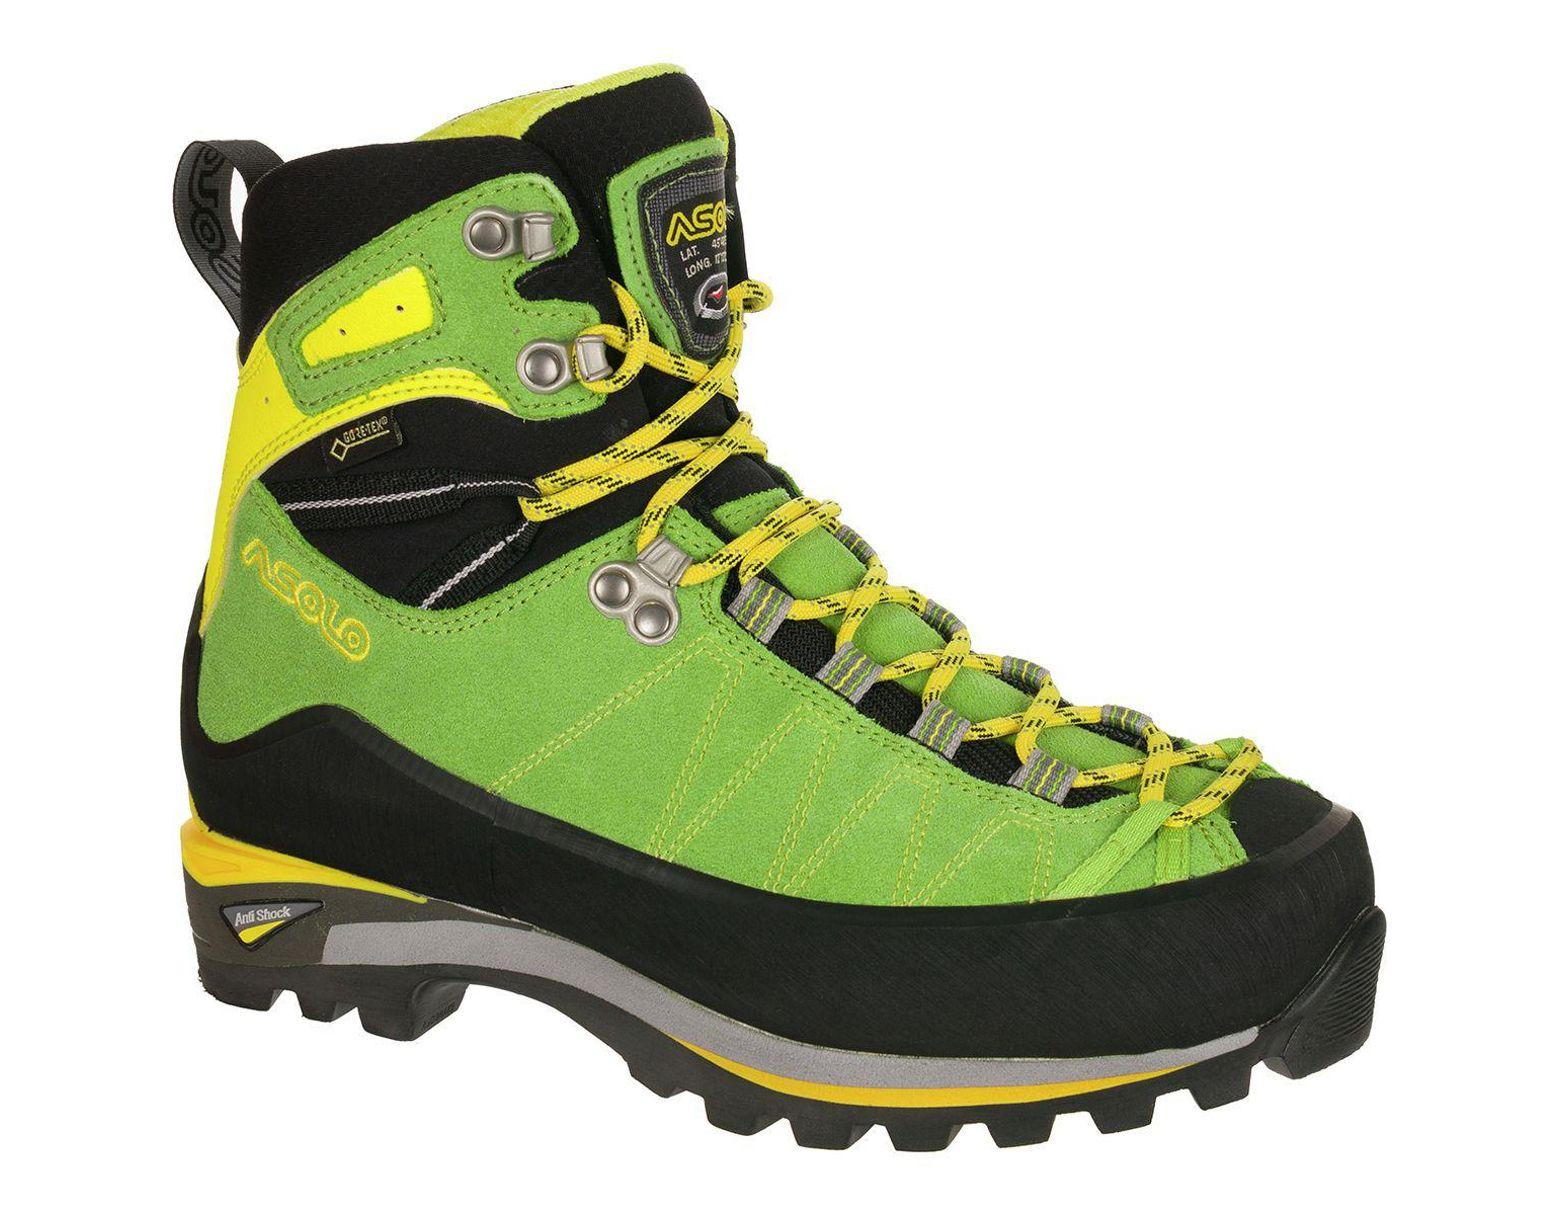 Gv Elbrus Mountaineering Women's Green Boot KJcFul13T